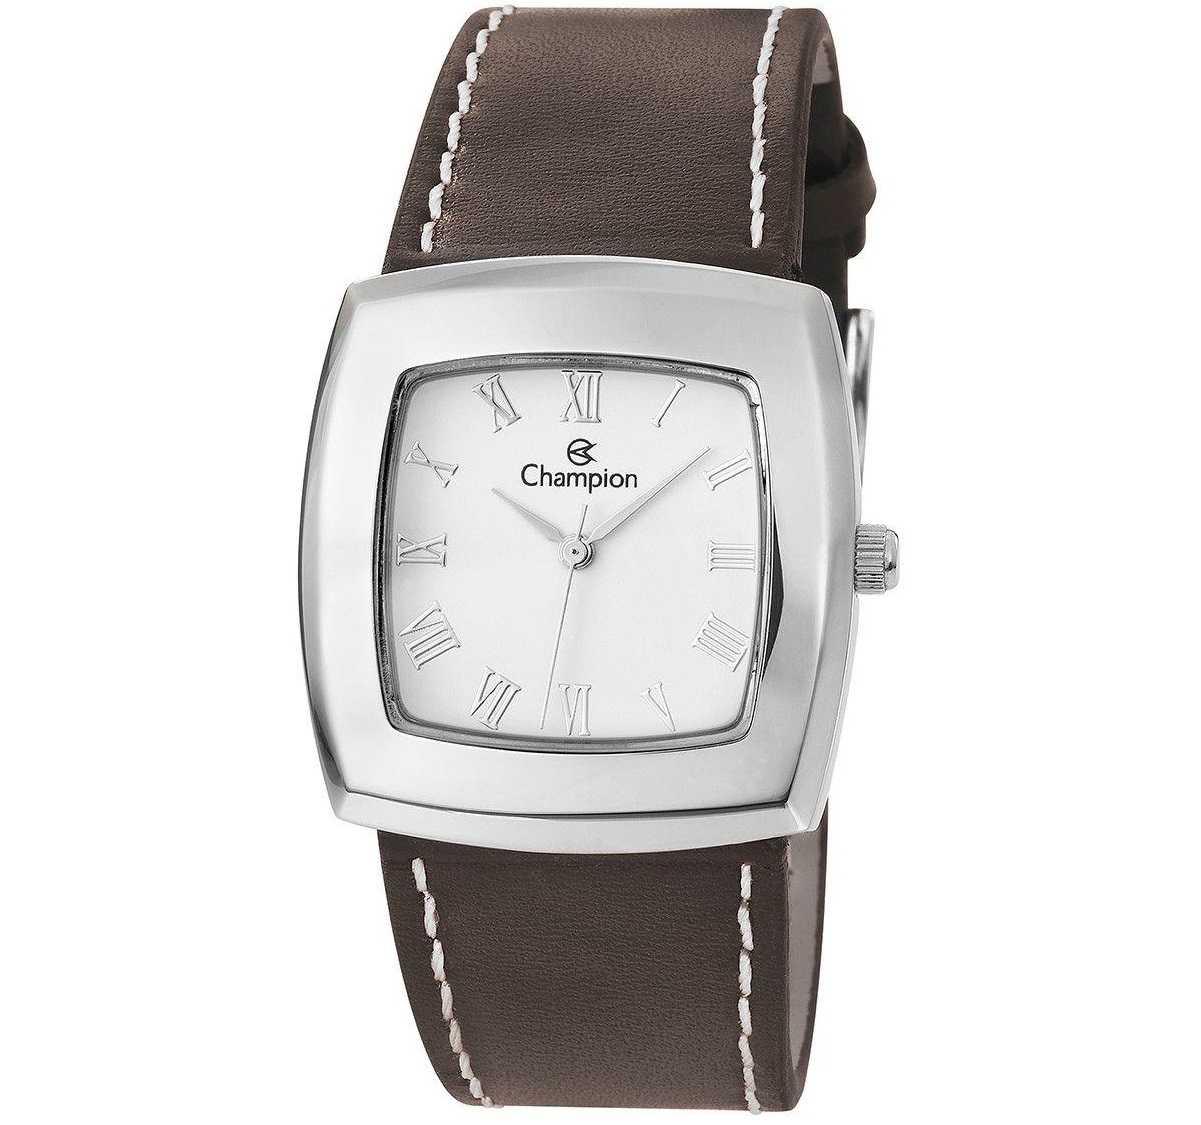 Relógio Champion Feminino Quadrado Marrom CH25650Q